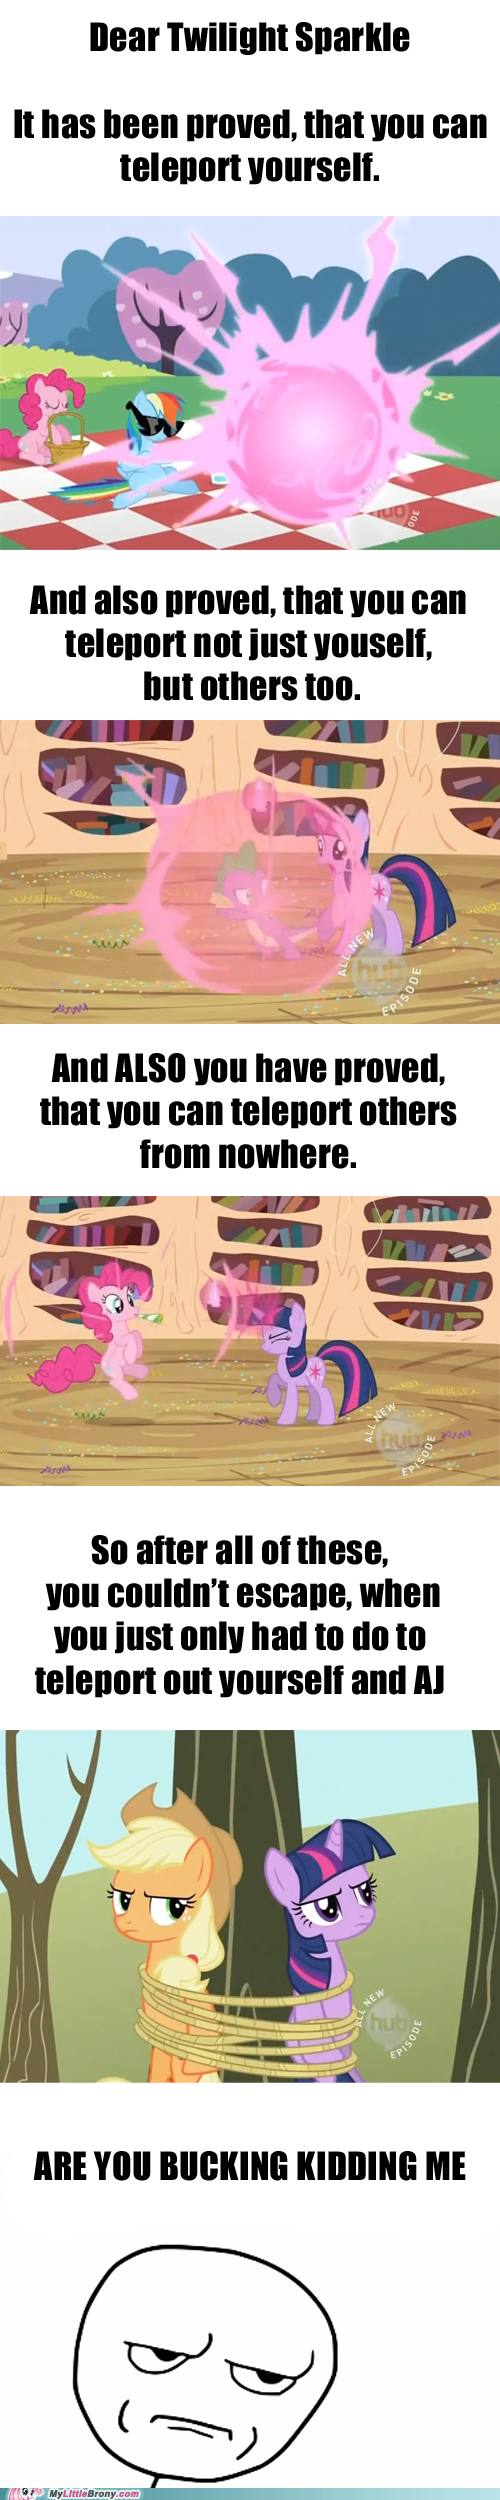 applejack bucking kidding me ponies teleport twilight - 5557398272